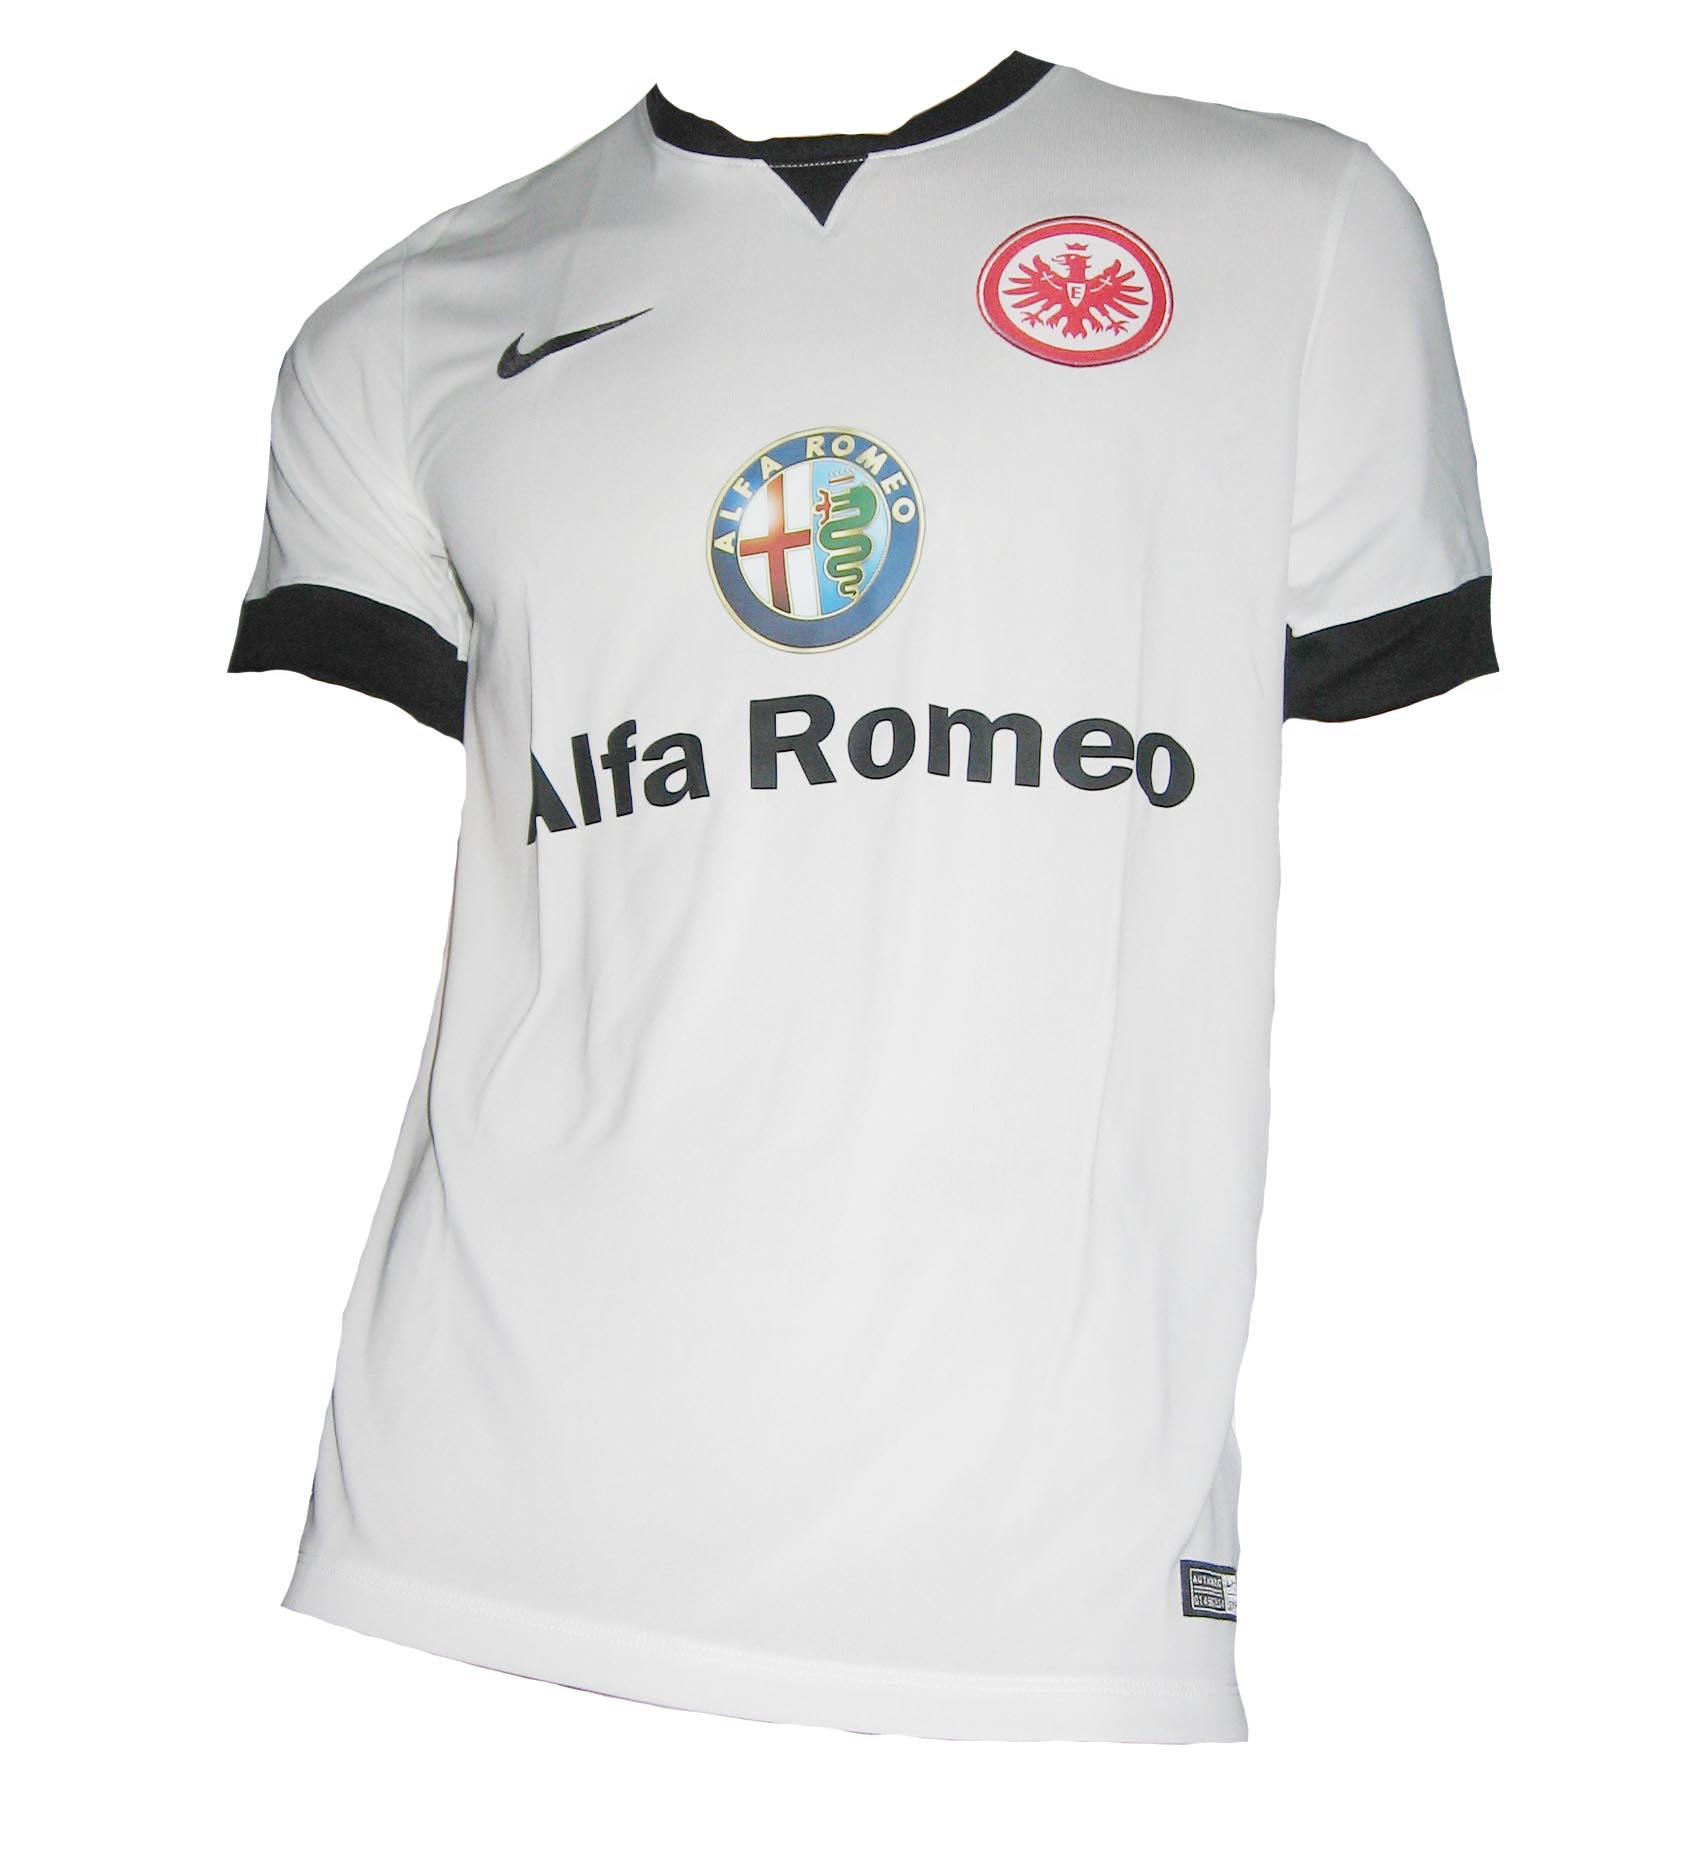 Eintracht Frankfurt Trikot Away Nike 201415 House Of Shirts